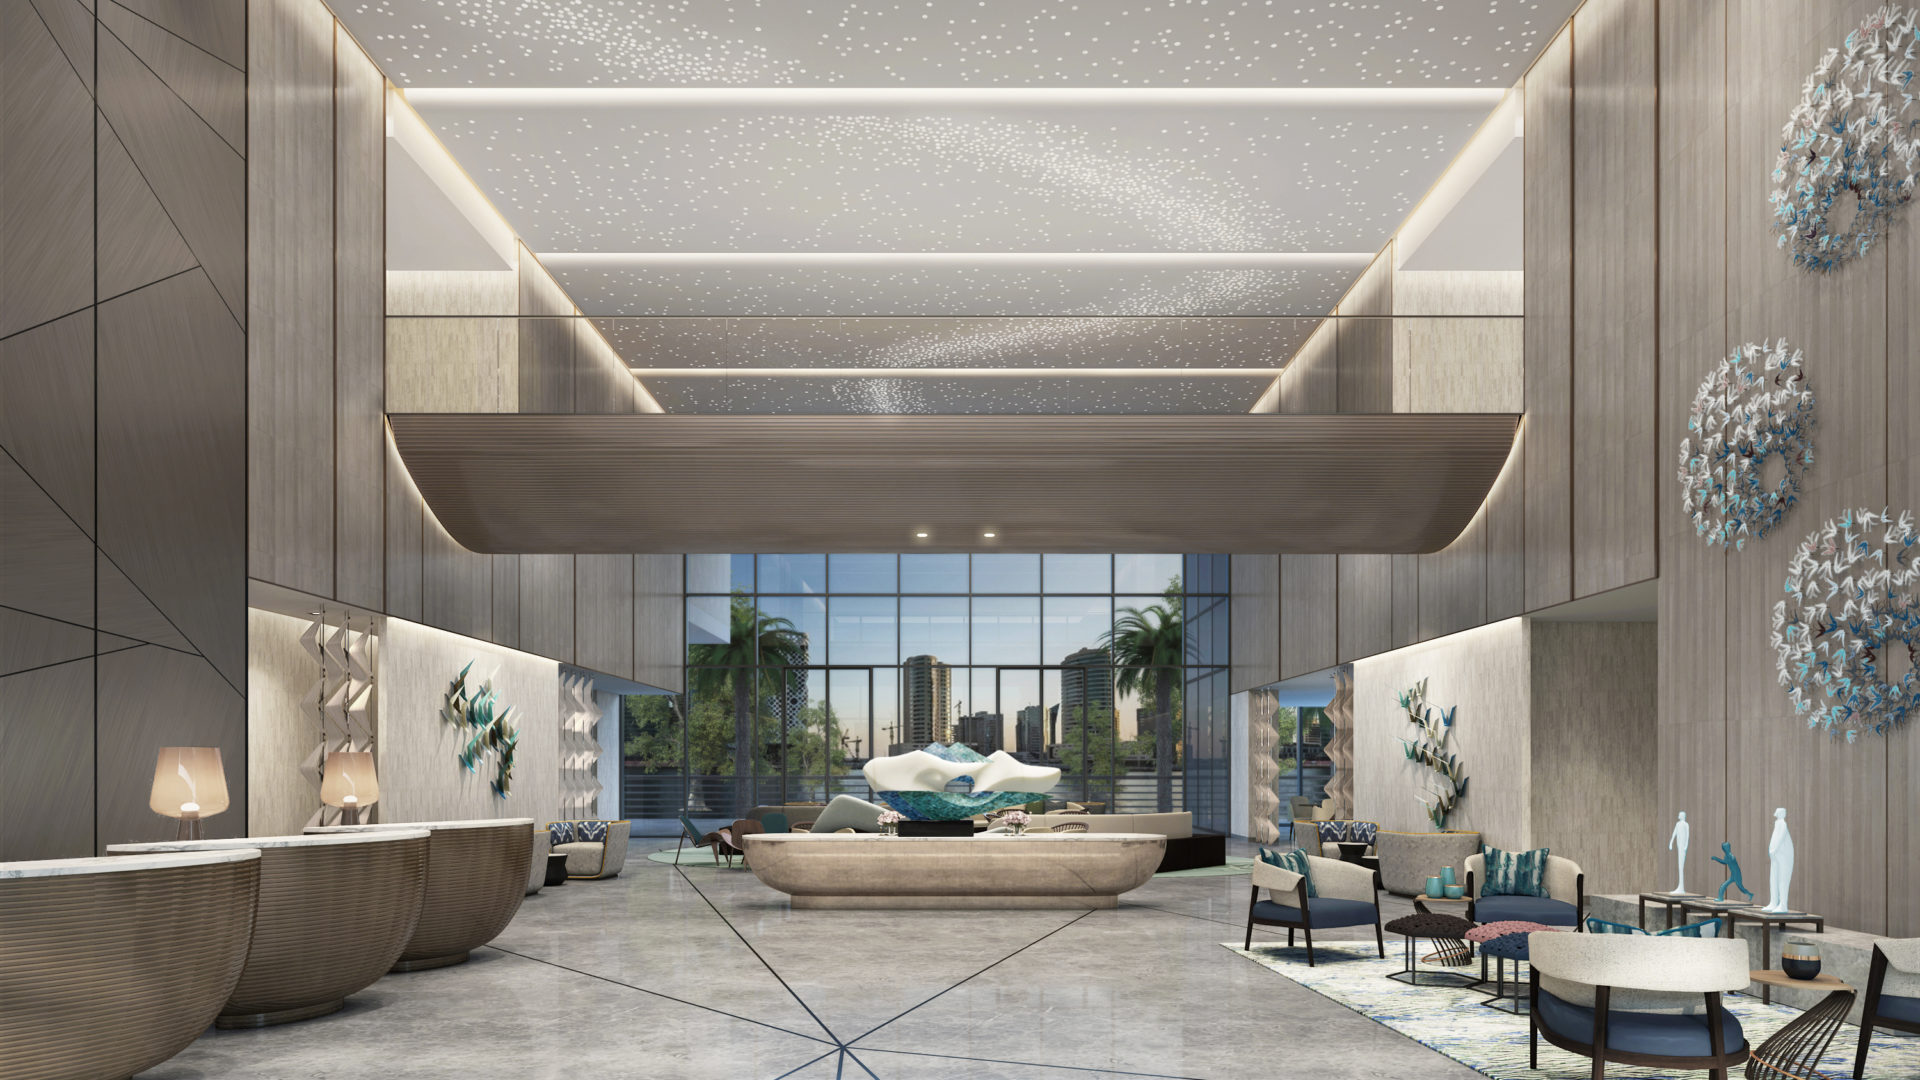 Crowne plaza_Lobby opt1_190210